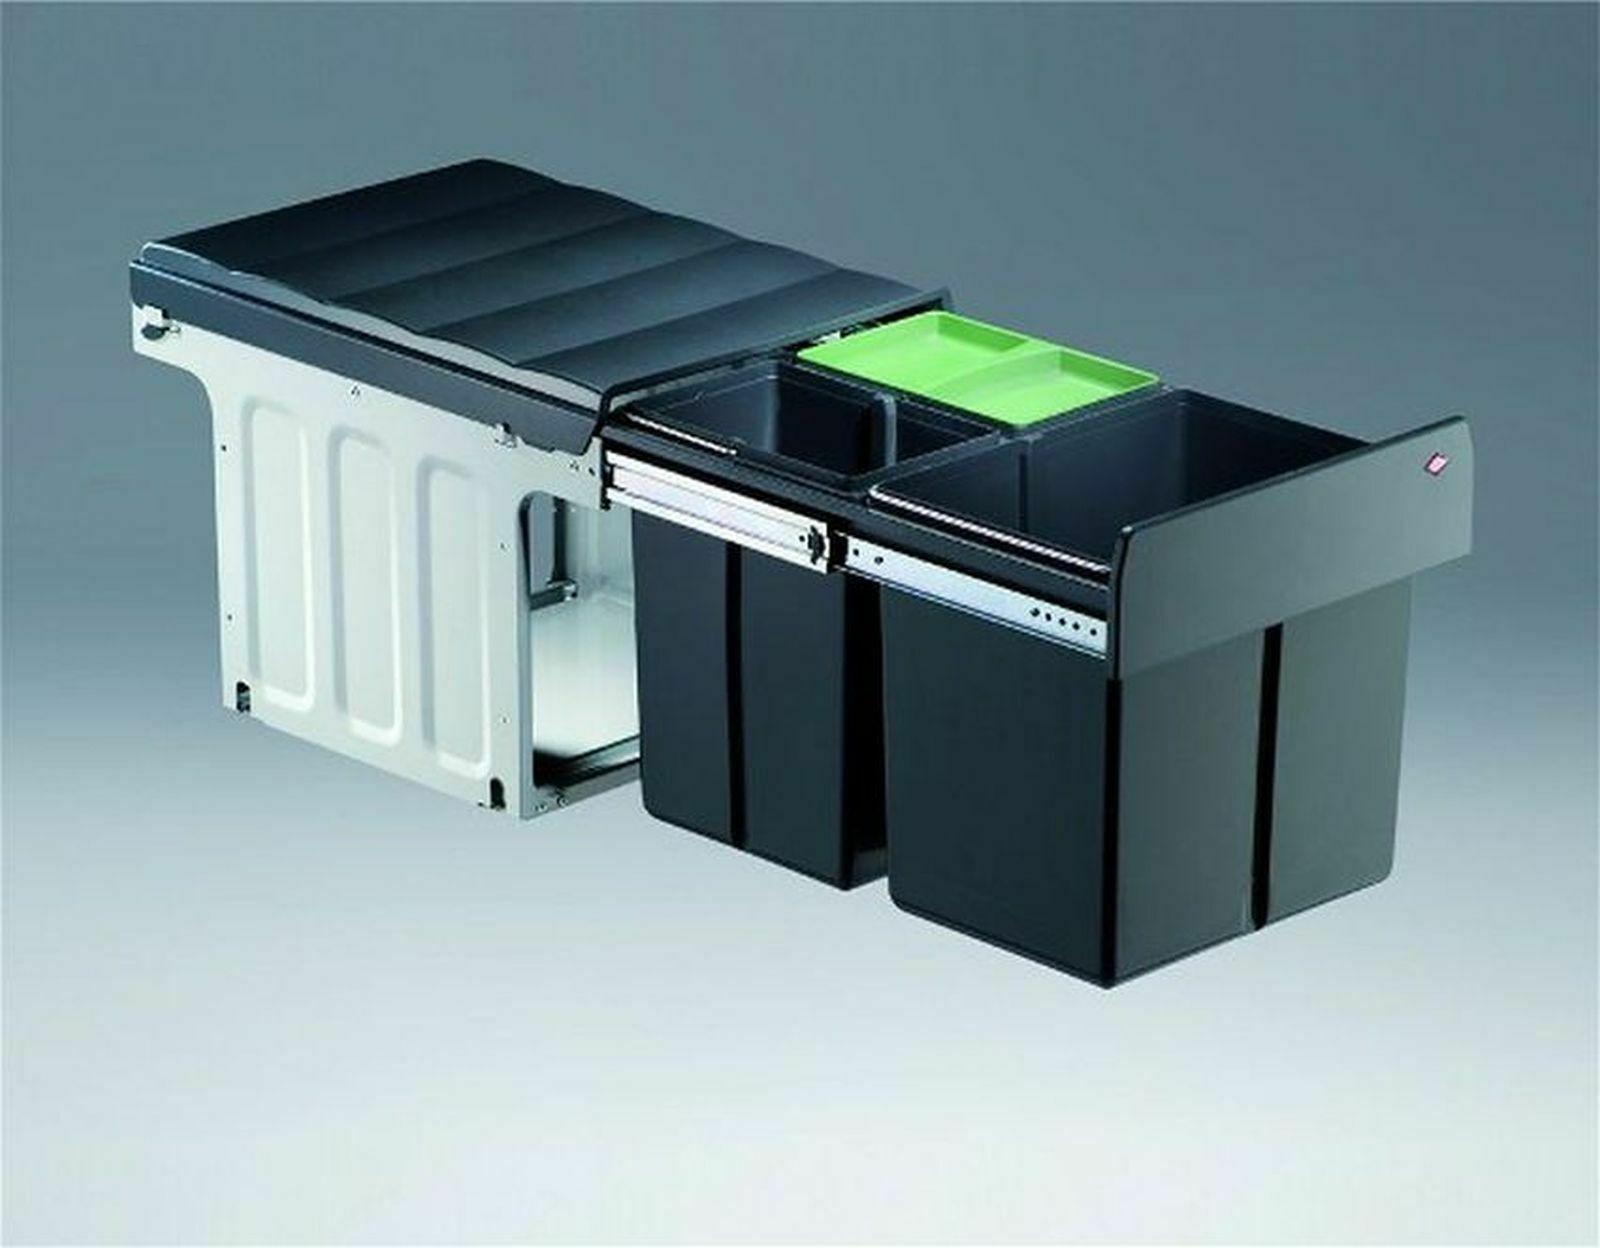 Häufig Mülleimer Küche Bioeimer Wesco Müllsystem Einbau ab 40 cm Trio OZ11